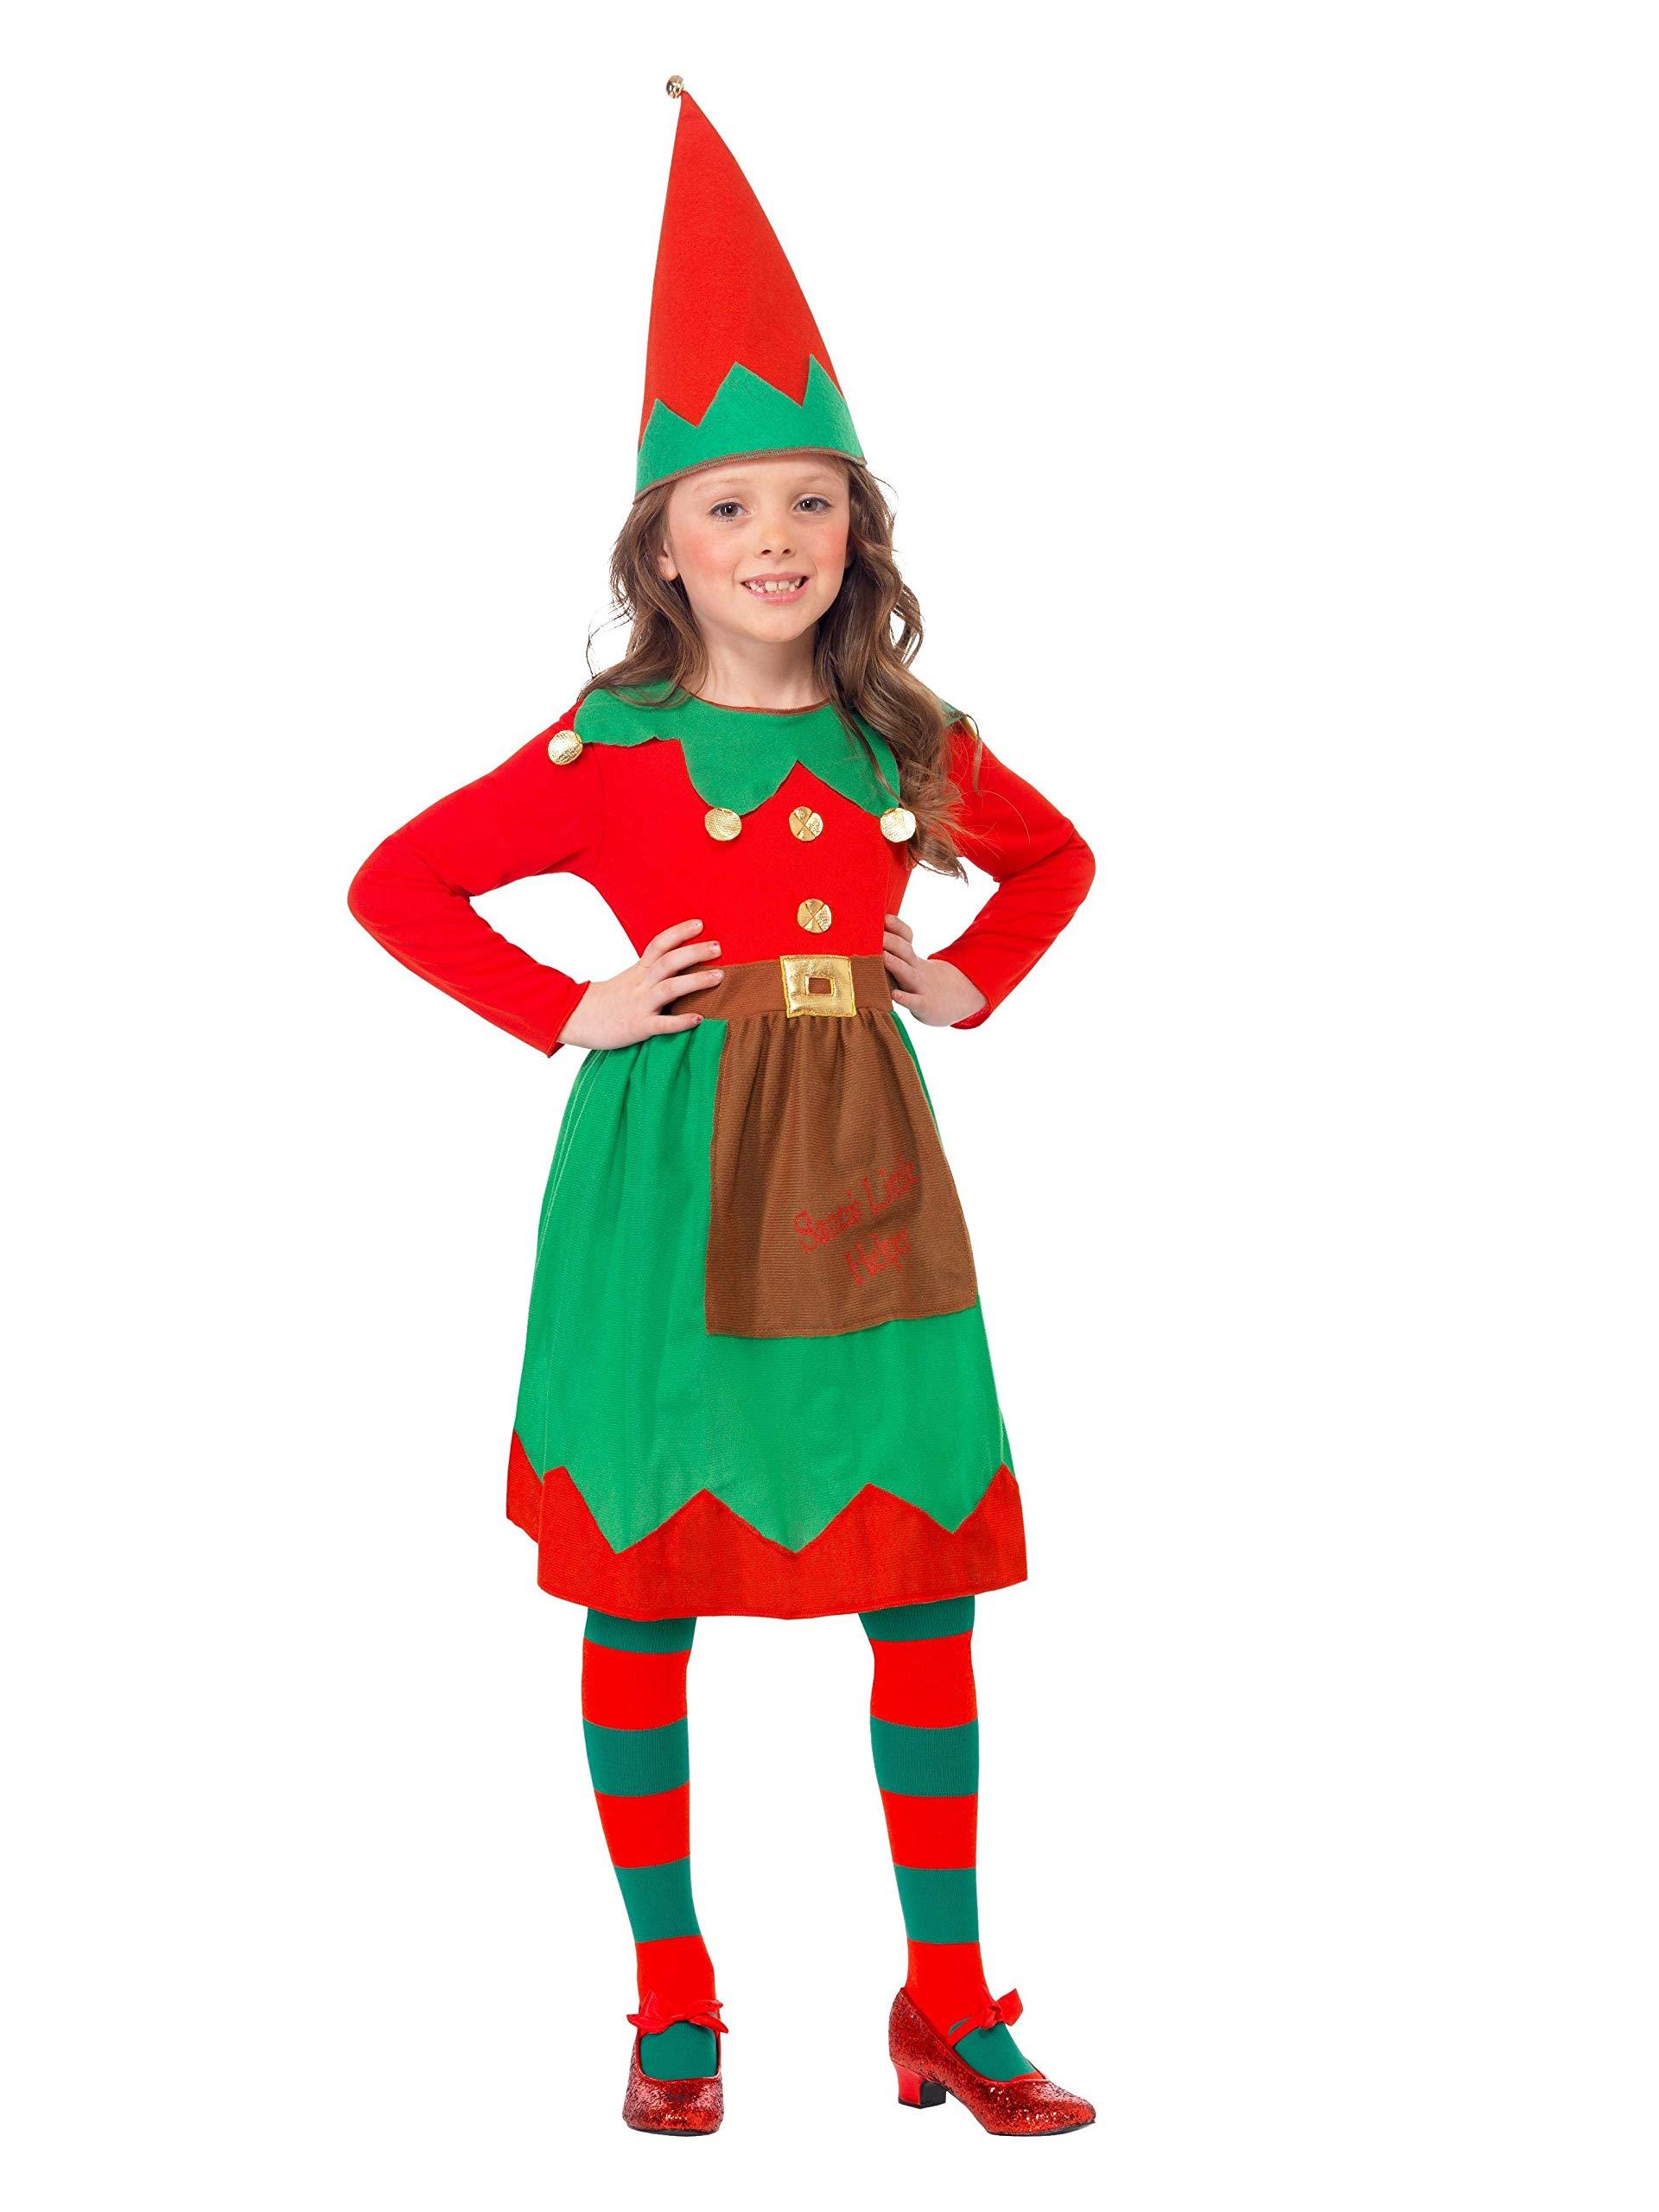 SALE Smiffys Elf Onsie Santa/'s Little Helper Christmas Fancy Dress Costume